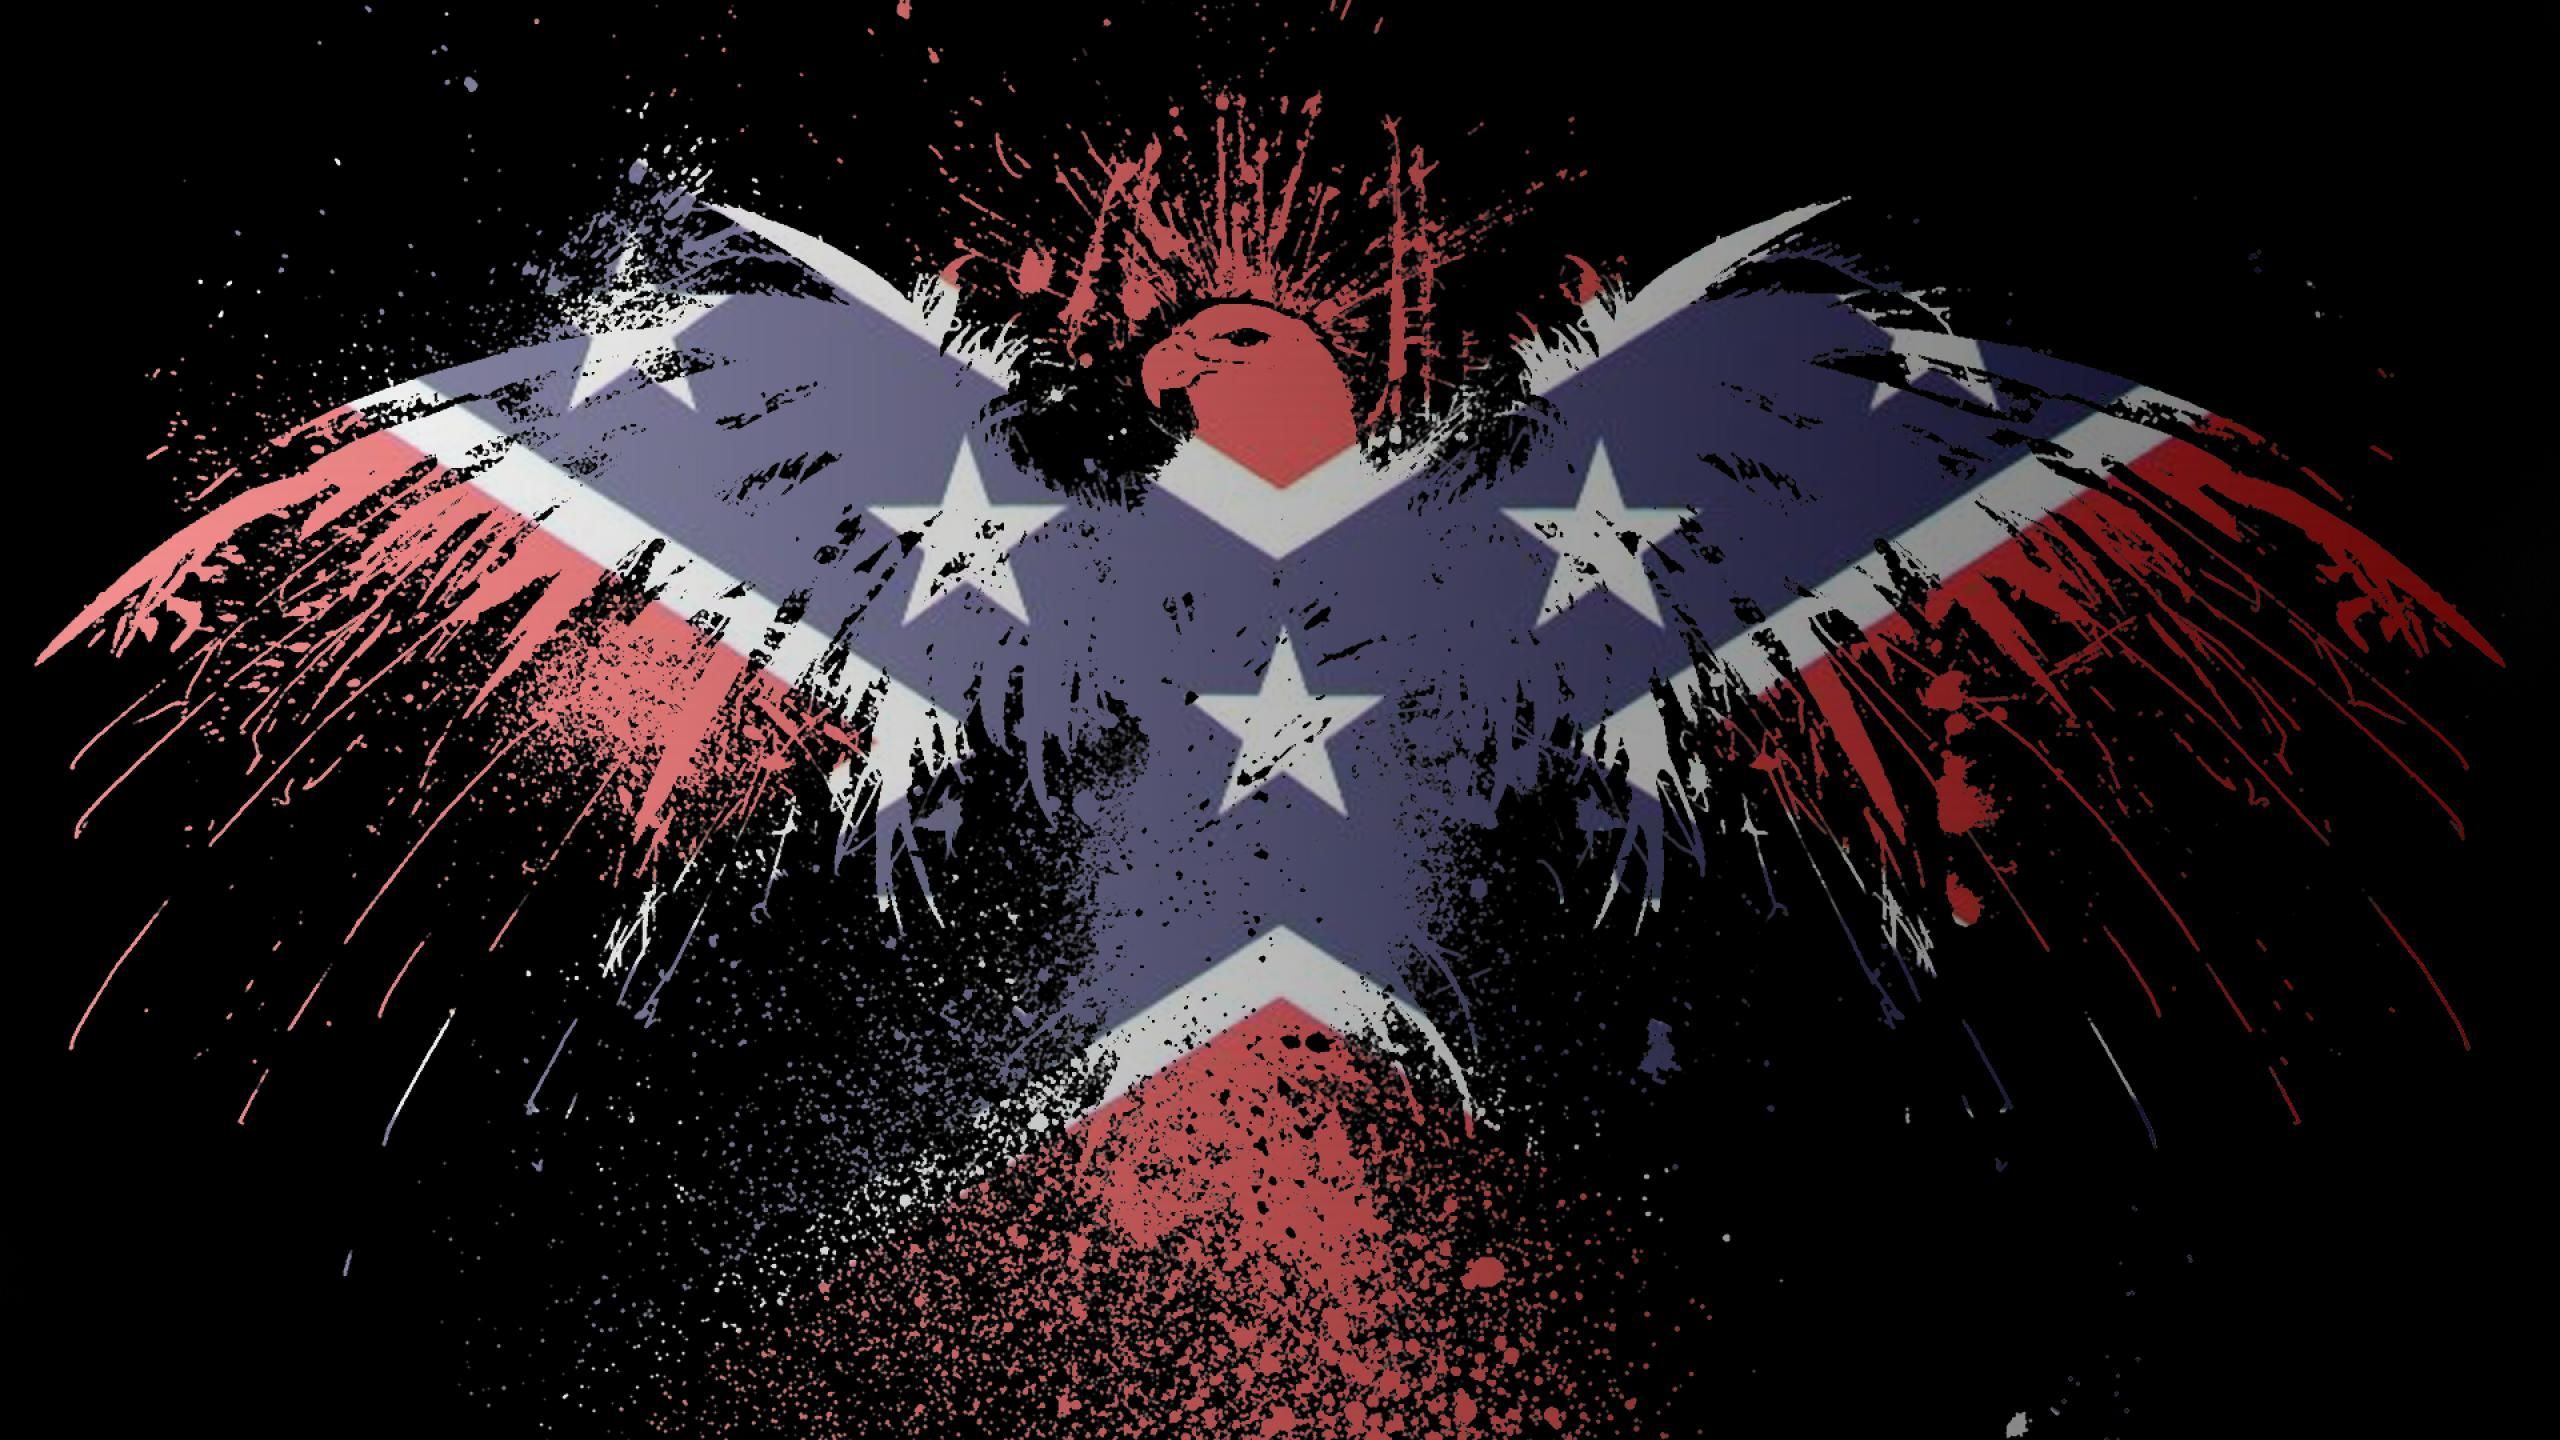 confederate flag 954267 2560x1440